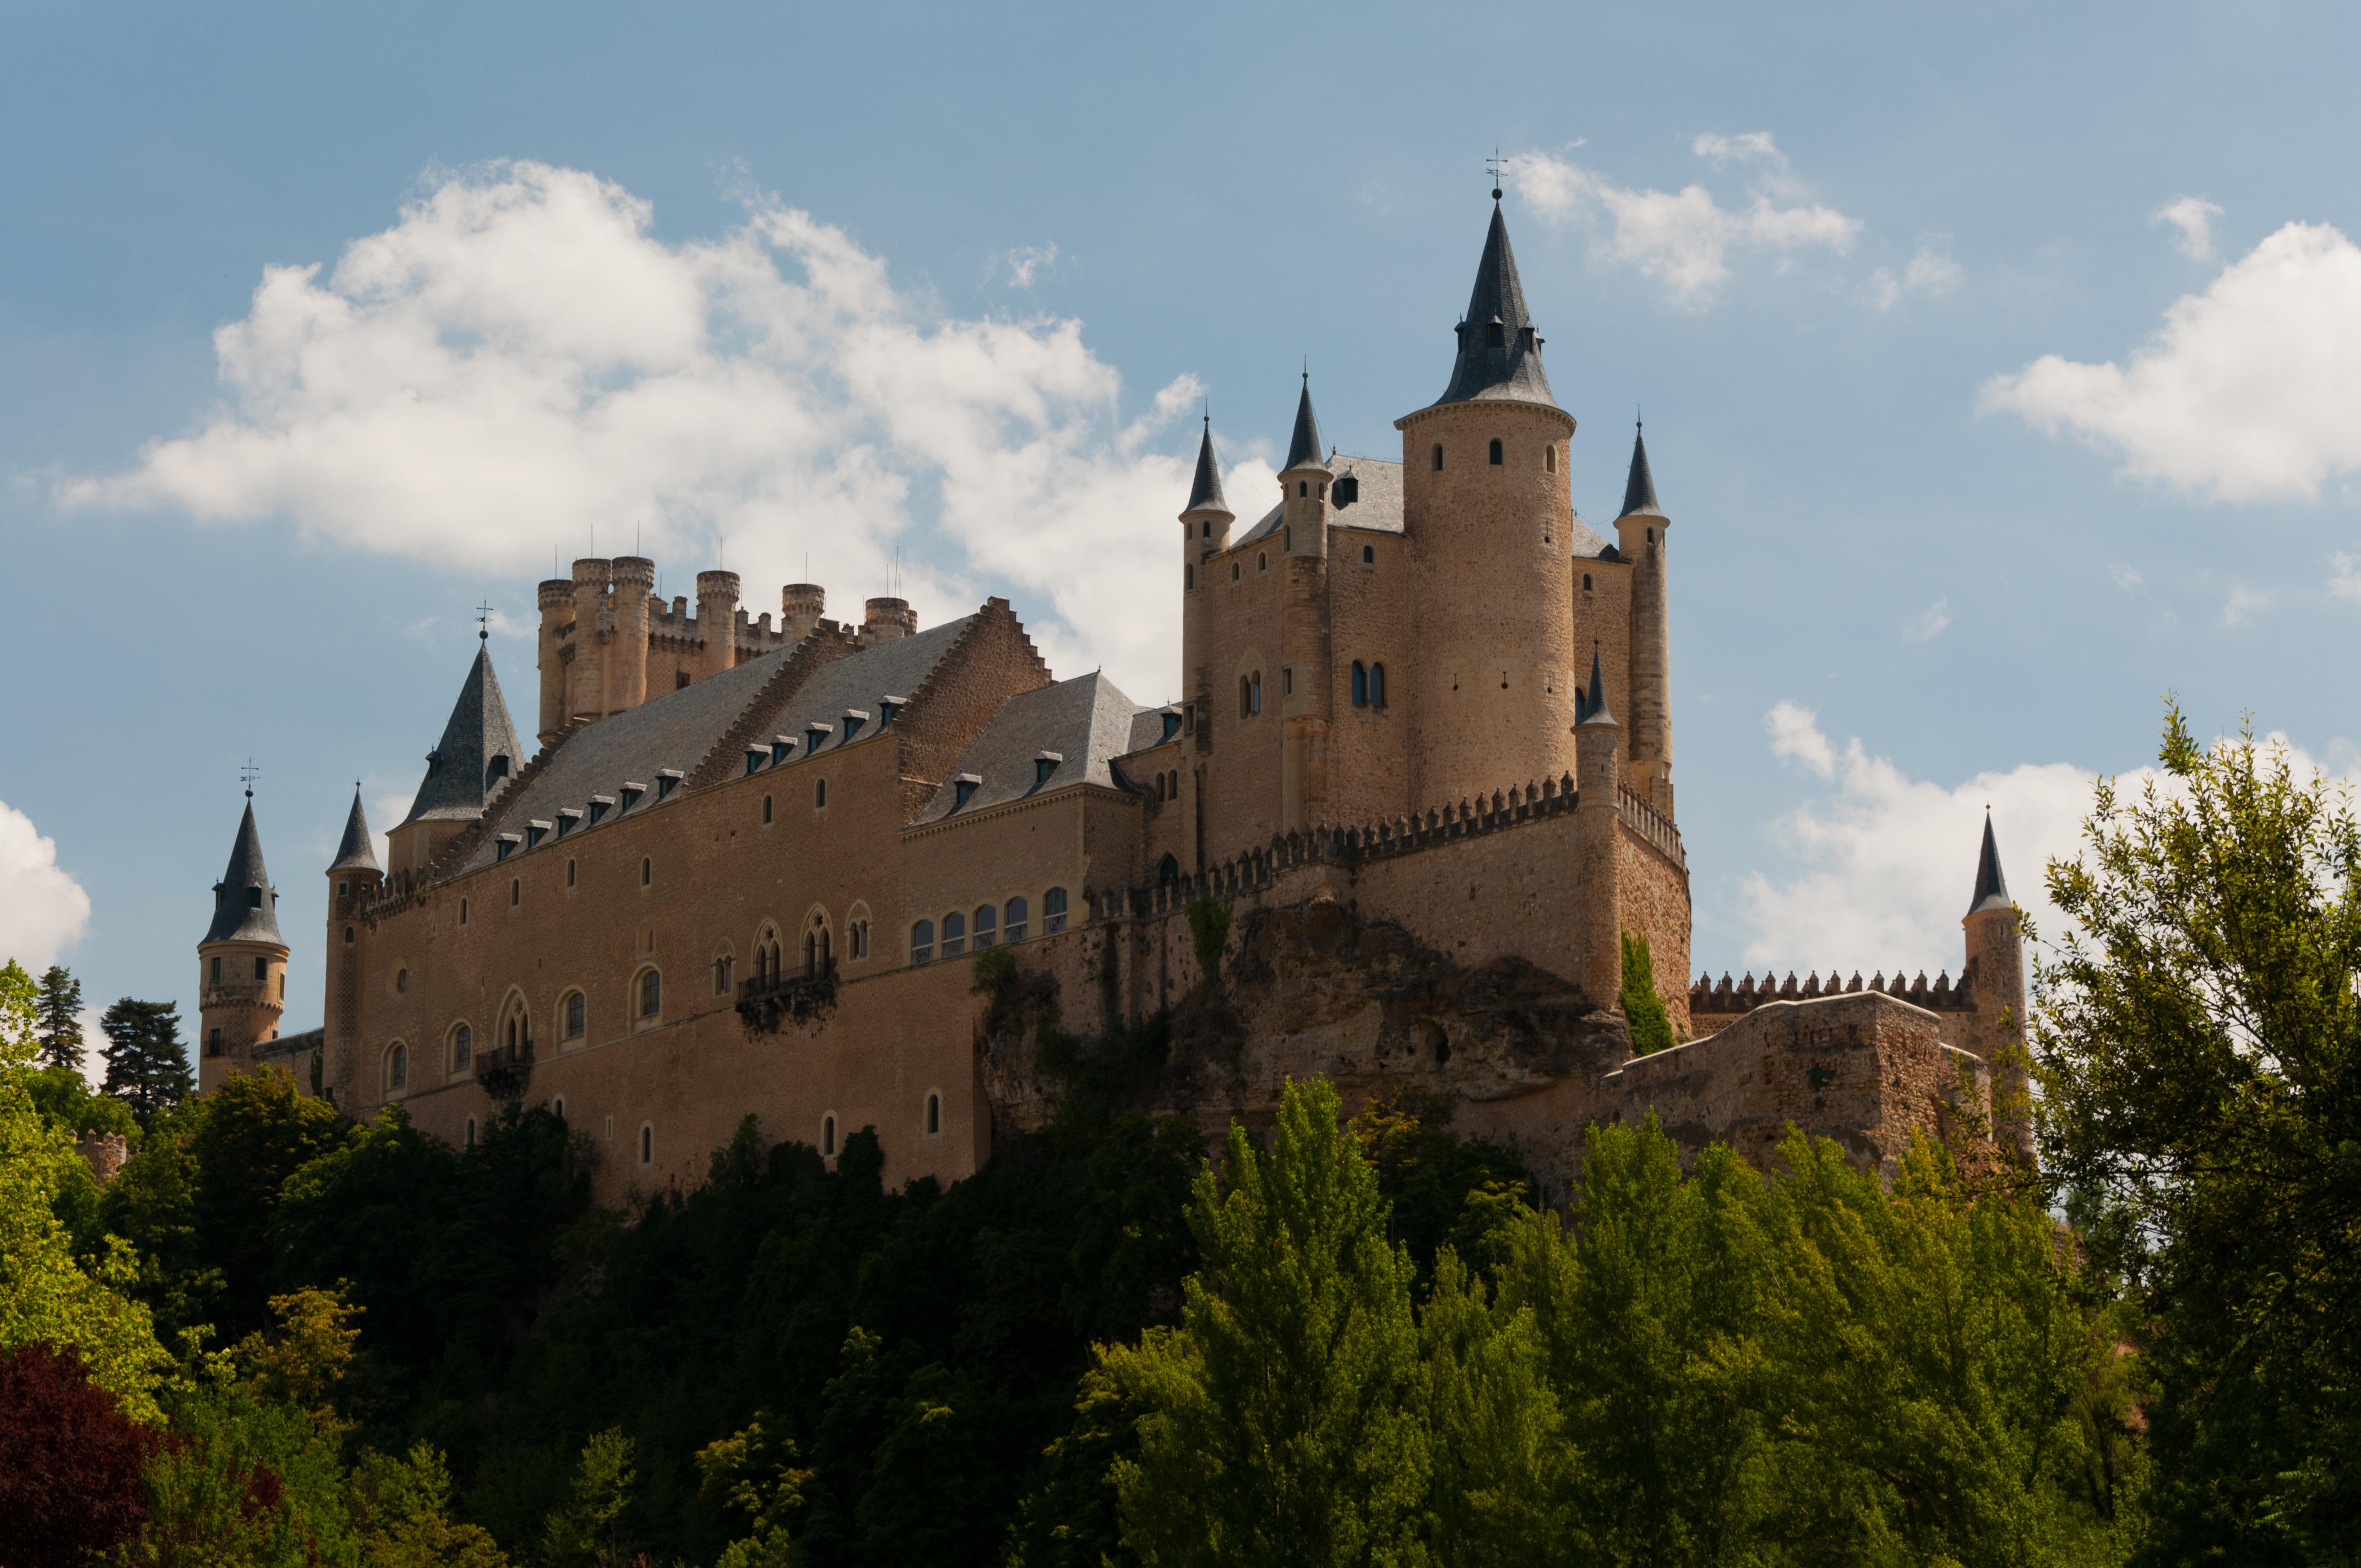 File:Alcázar de Segovia-9.jpg - Wikimedia Commons